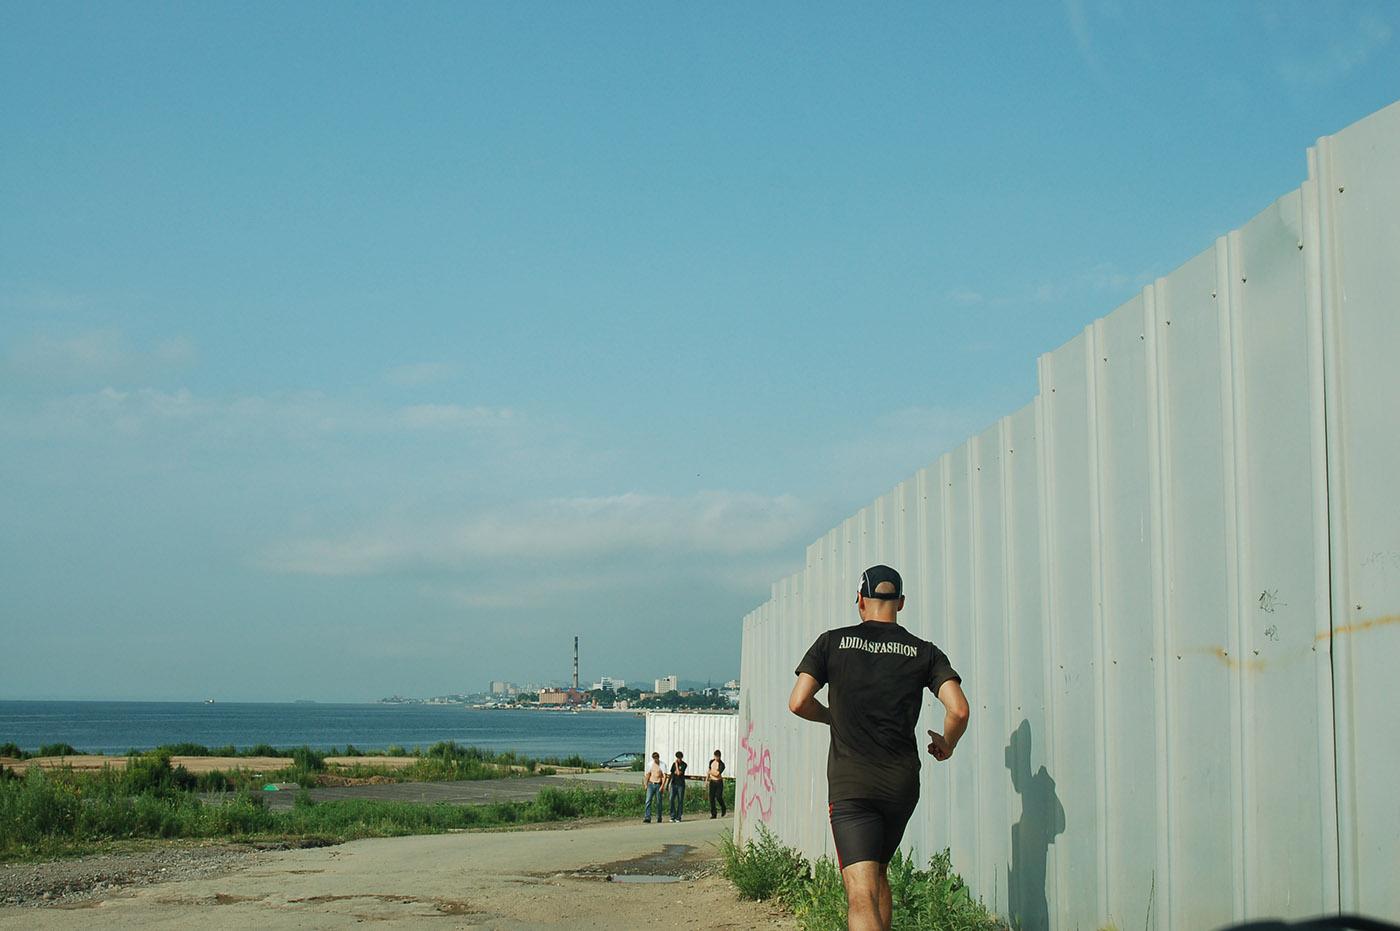 Владивосток, Приморский край |  Vladivostok, Primorsky Krai, 2009.